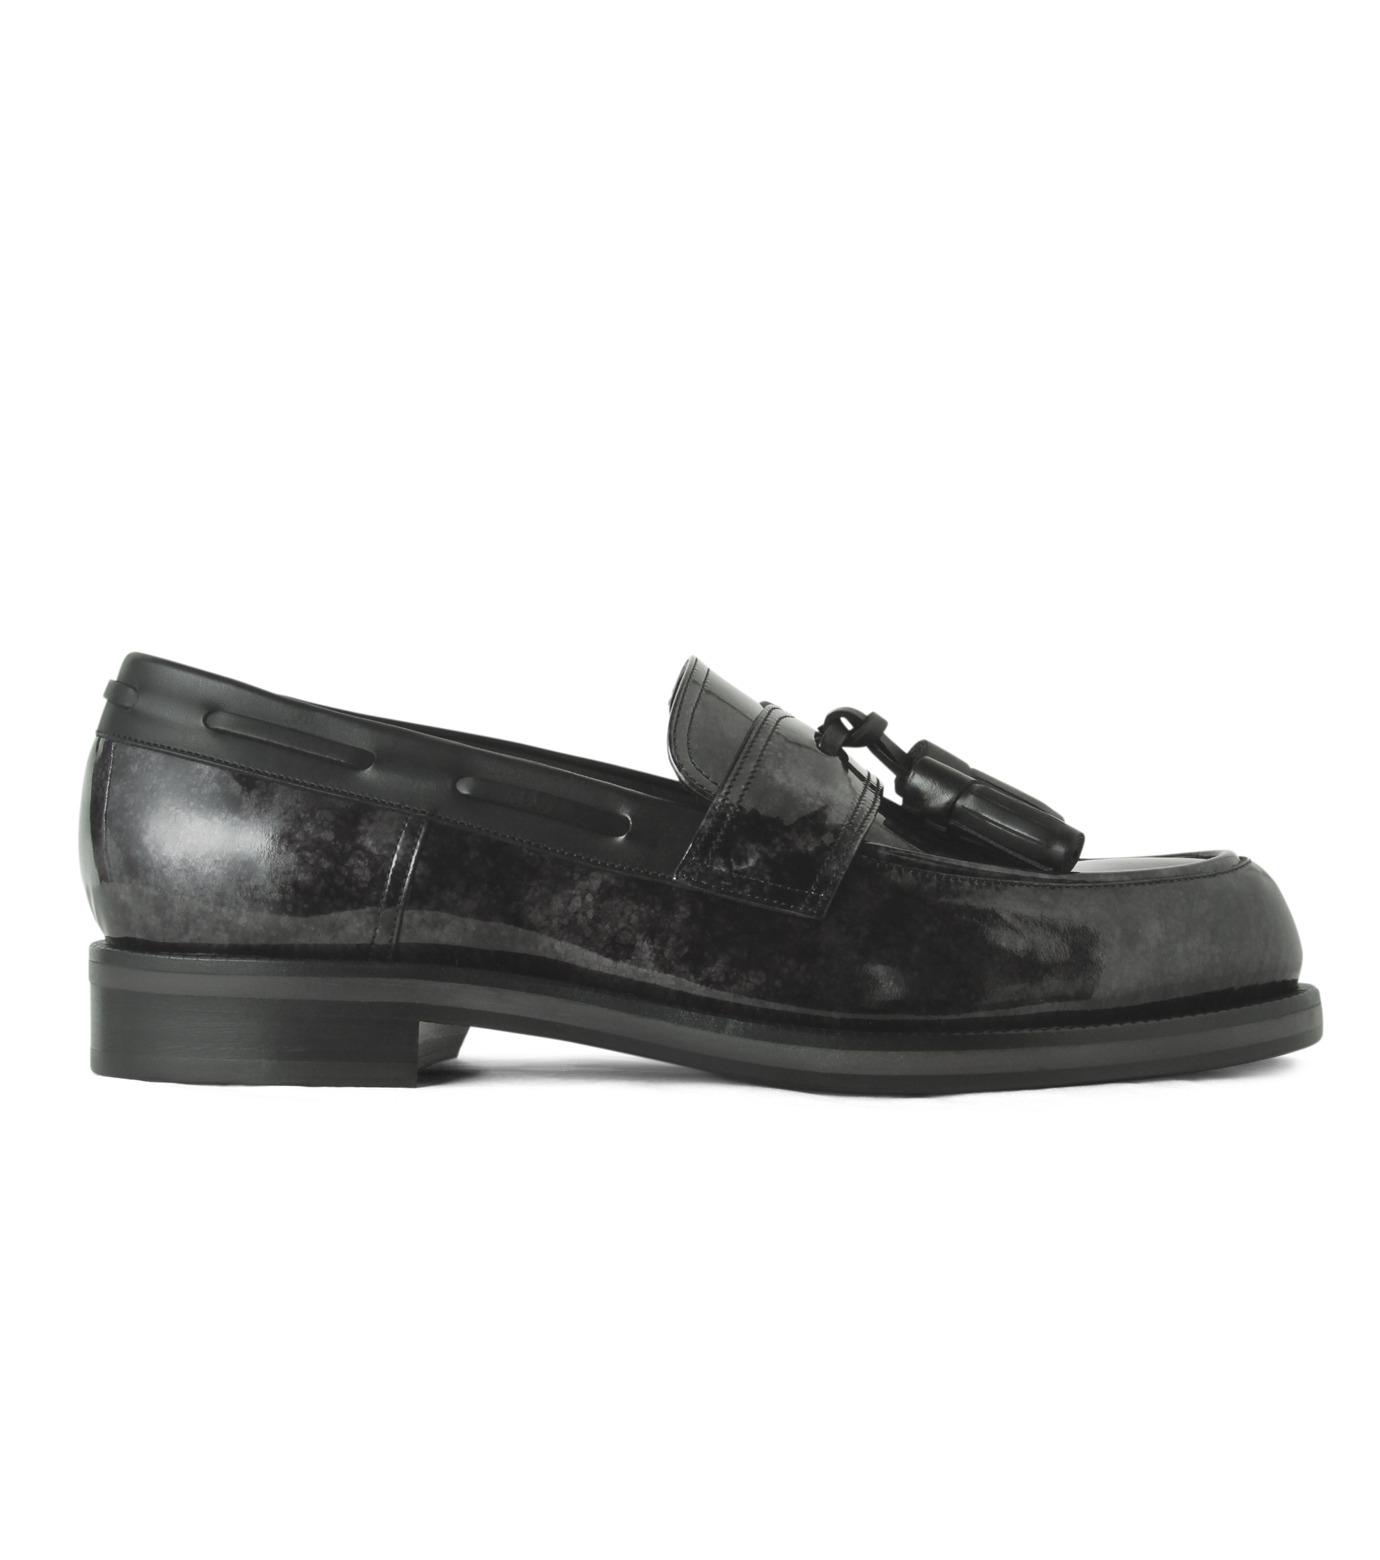 Jimmy Choo(ジミーチュウ)のMarble Patent-BLACK(シューズ/shoes)-NATHAN-MBP-13 拡大詳細画像1